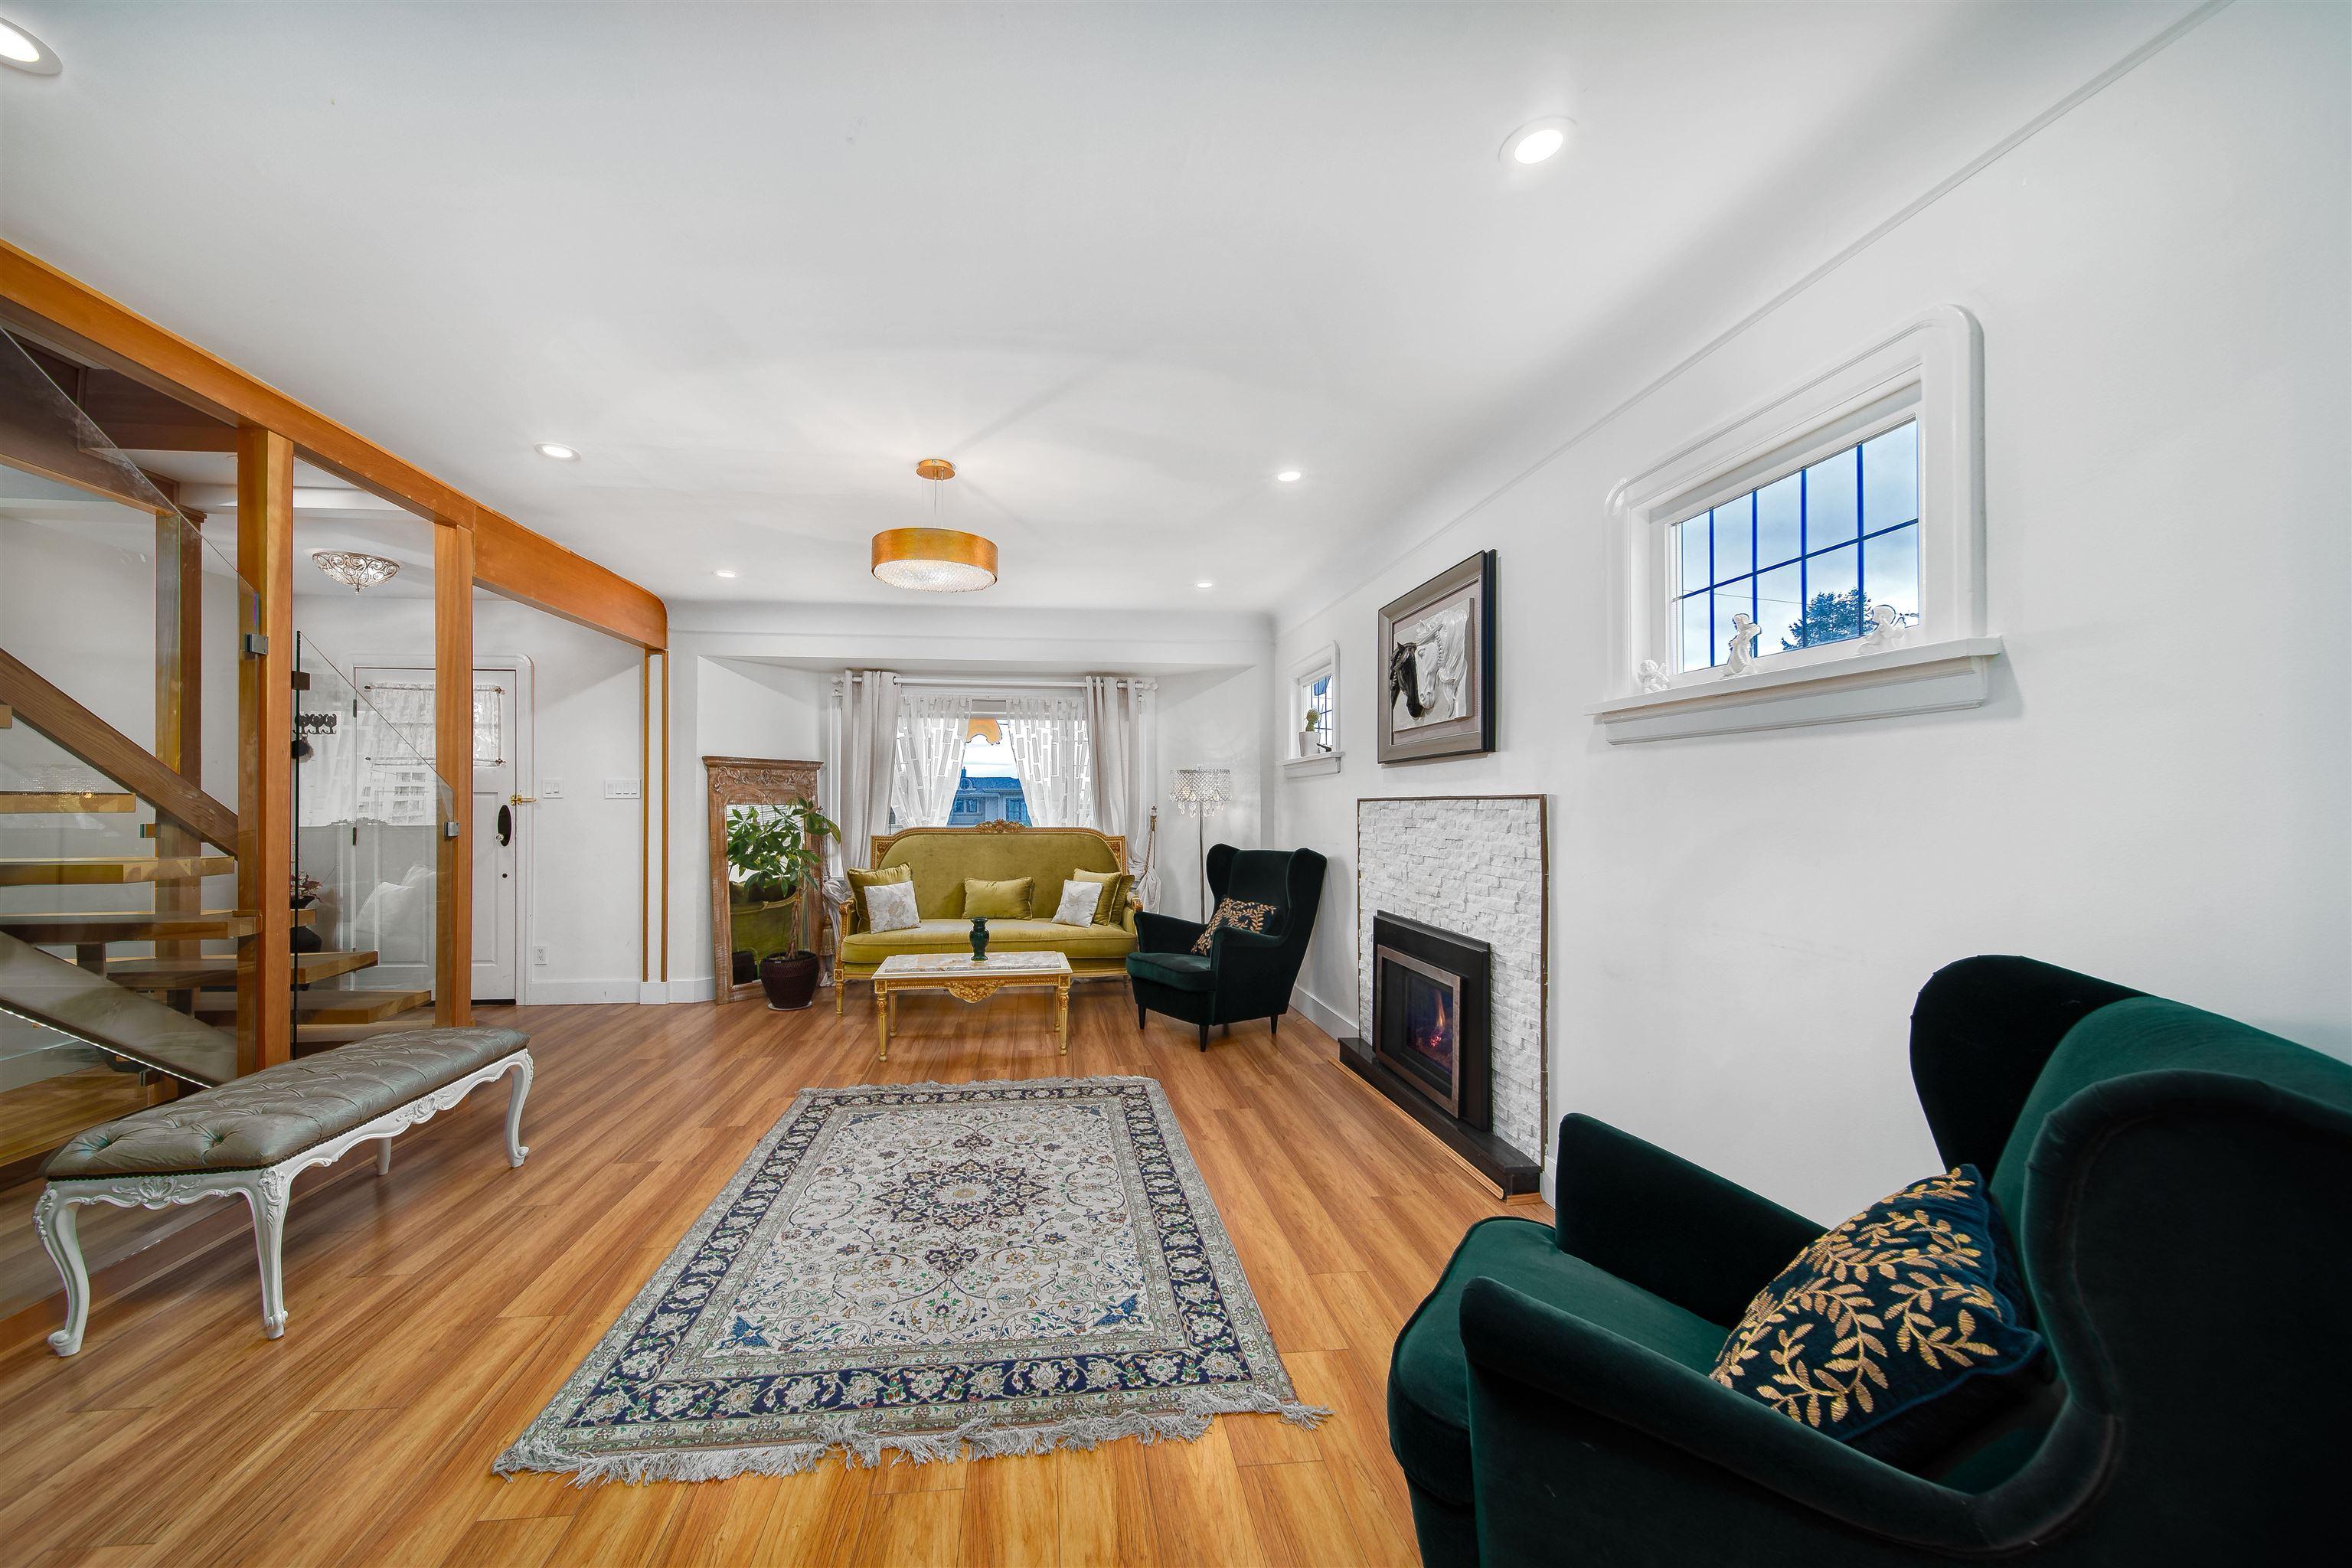 1357 FULTON AVENUE - Ambleside House/Single Family for sale, 6 Bedrooms (R2617731) - #10